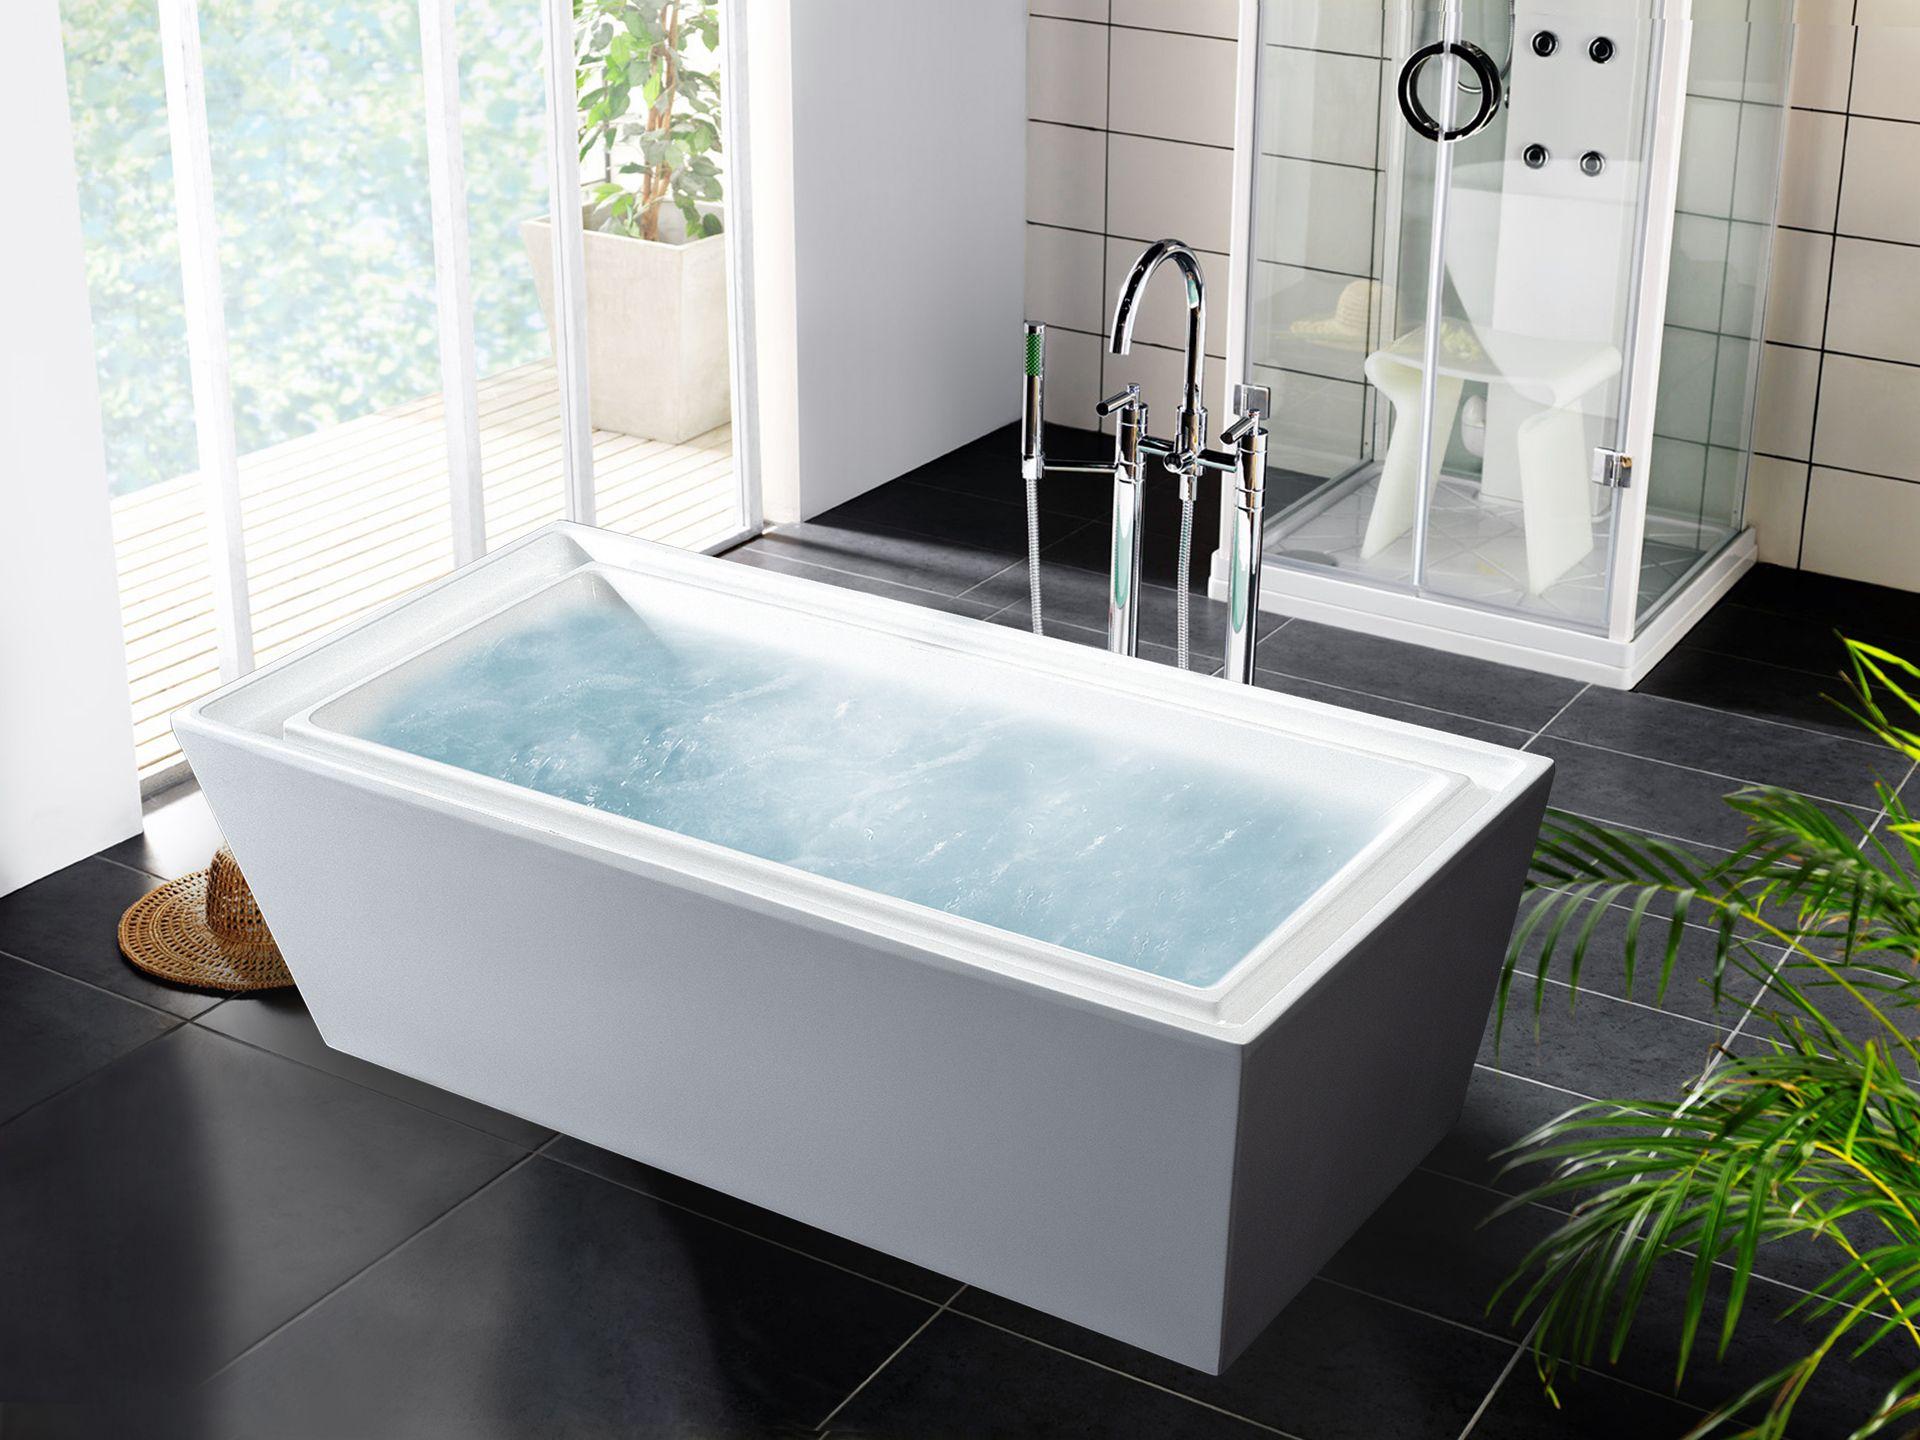 Aquatica PureScape 040 Freestanding Acrylic Bathtub (Dimensions: in. H),  White, Size 66 to 71 inches